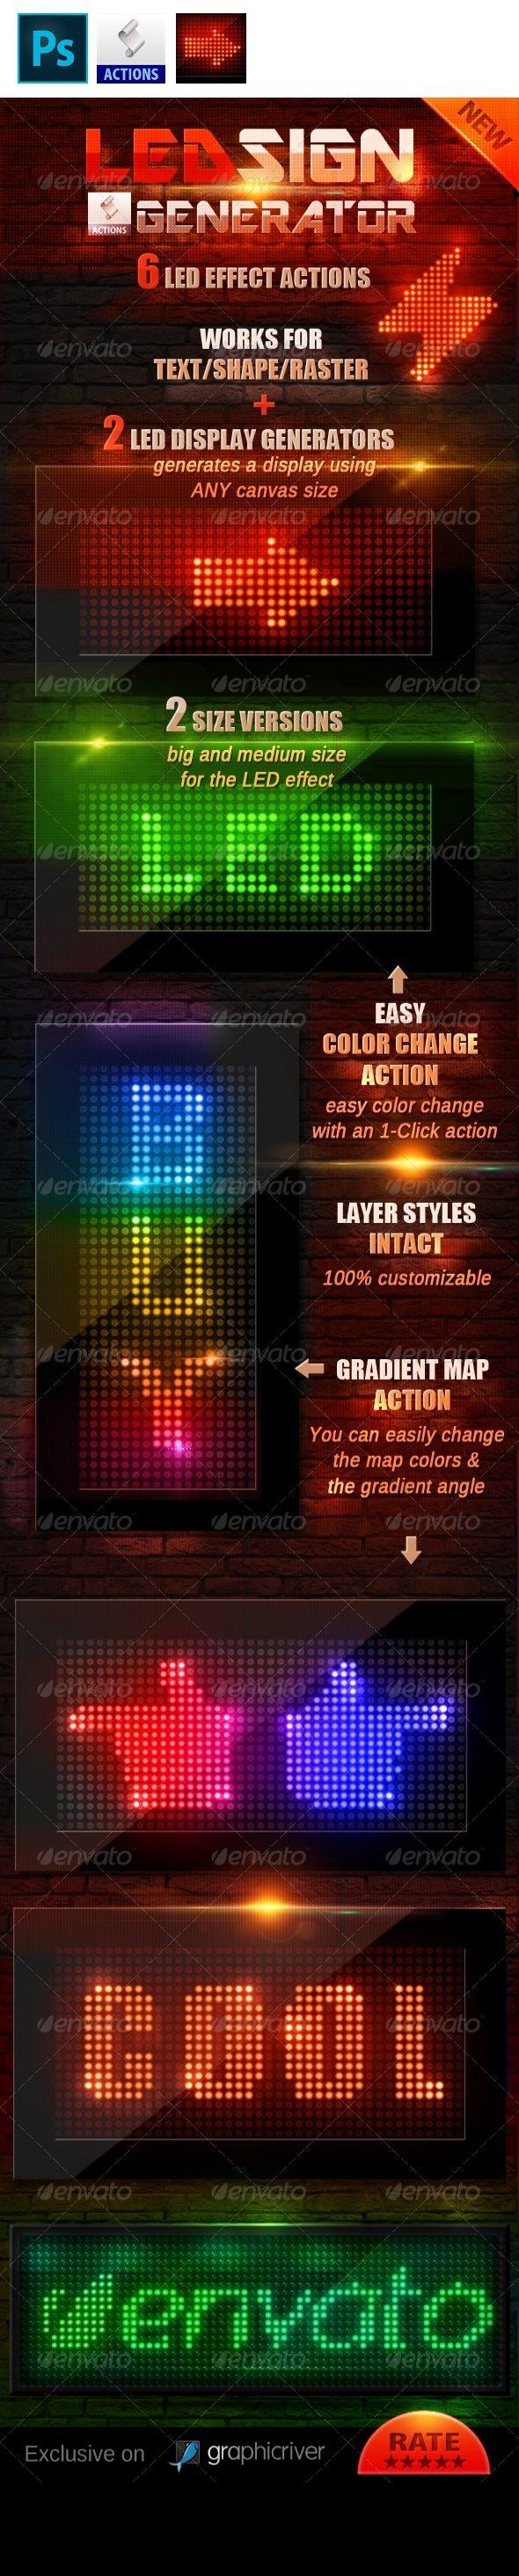 clock display, display screen, lcd, led, led display, led